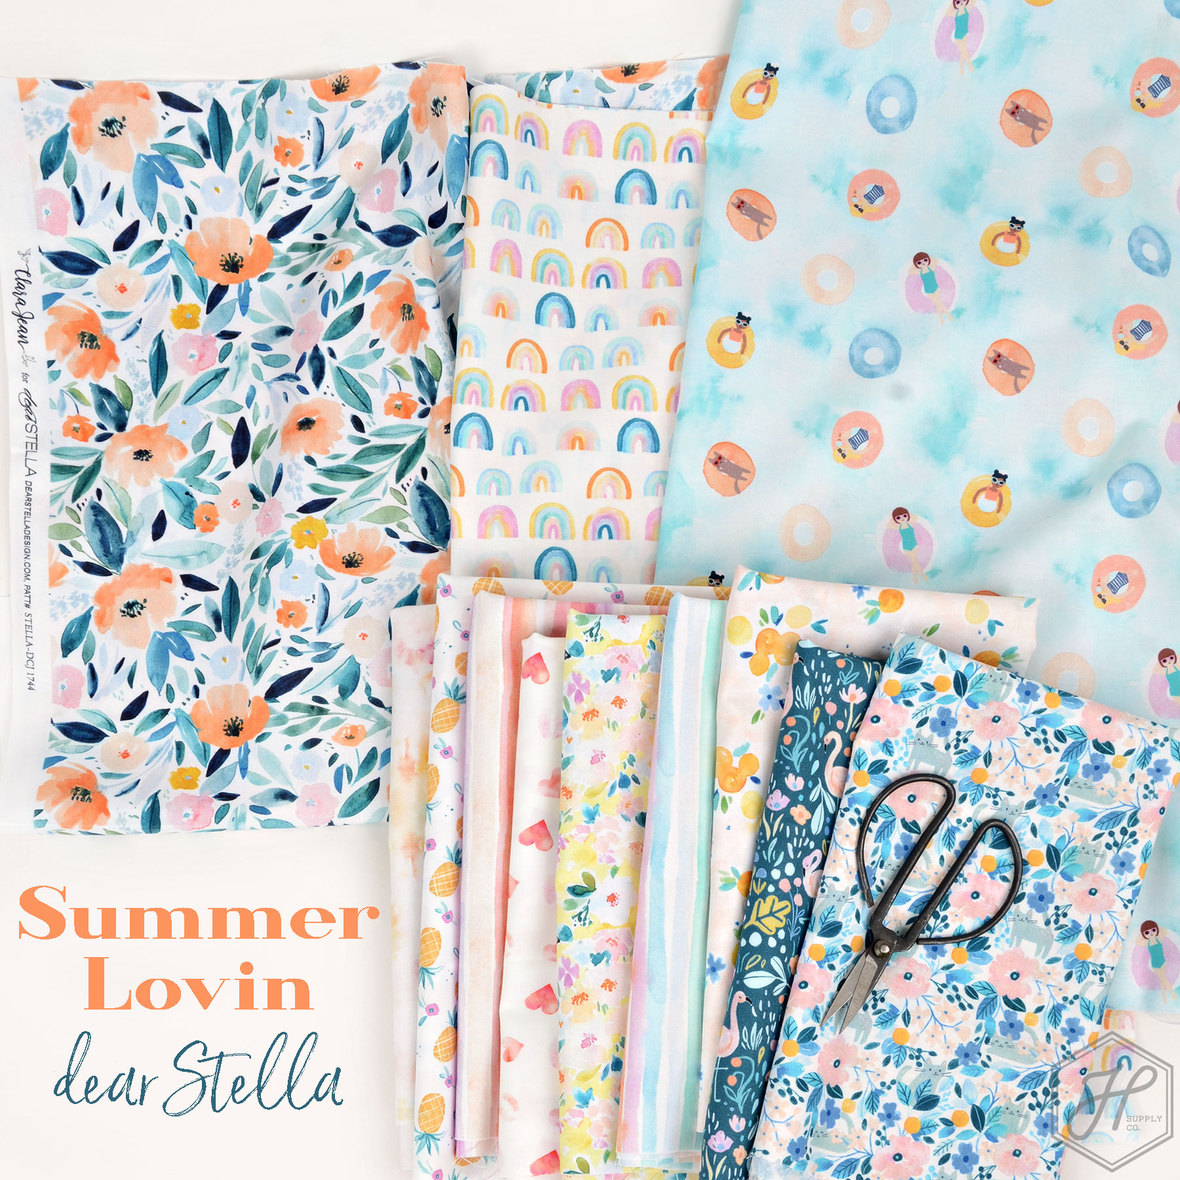 Summer-Lovin-fabric-Dear-Stella-and-Clara-Jean-at-Hawthorne-Supply-Co